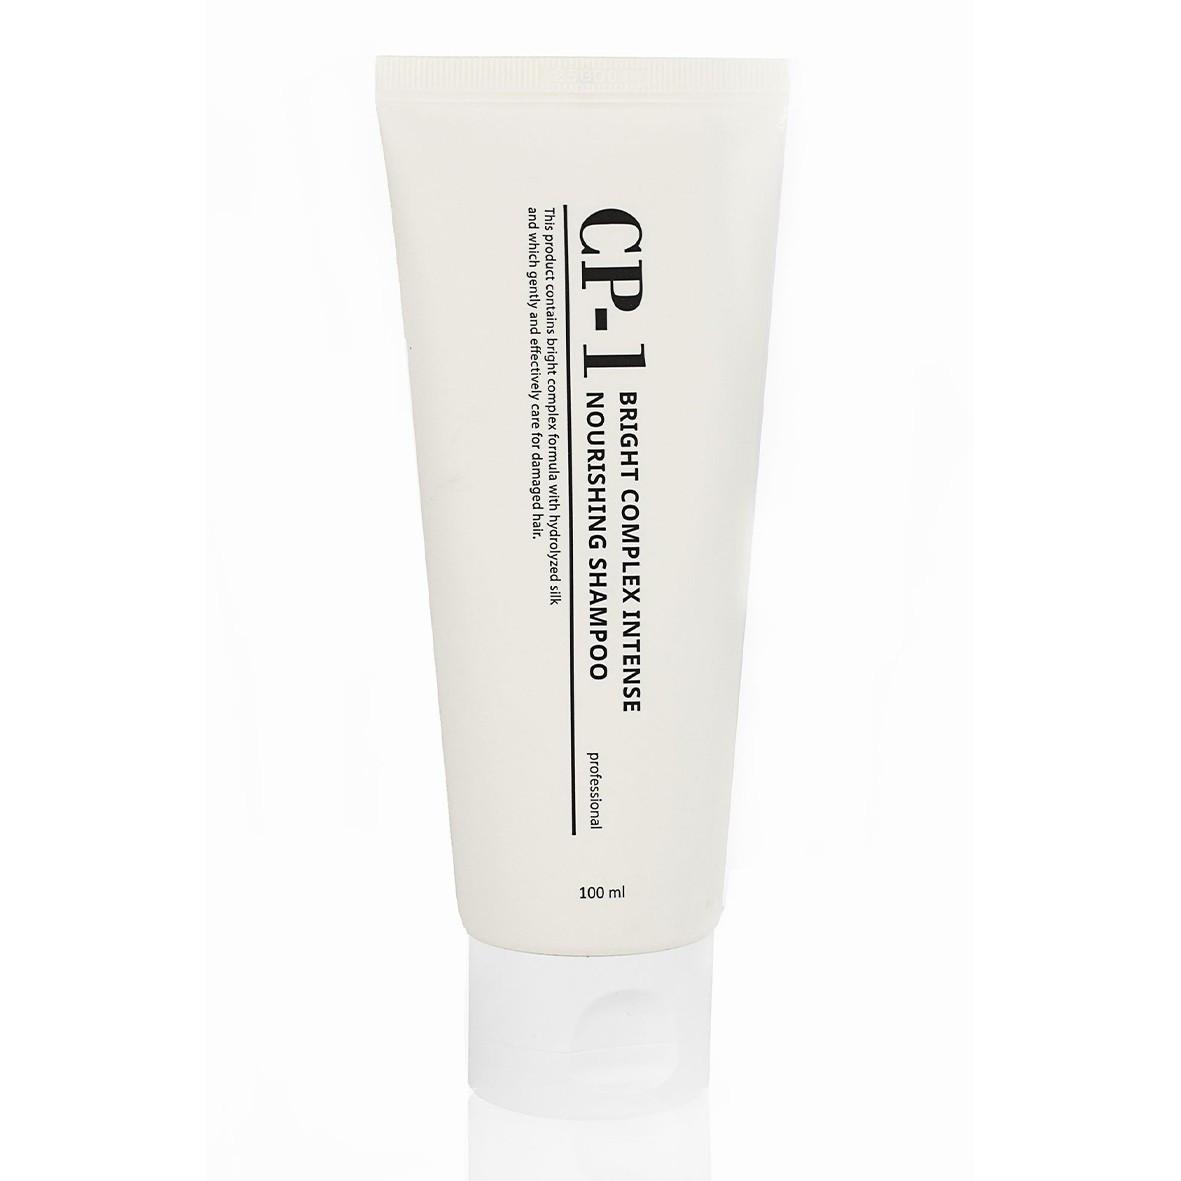 Интенсивно питающий шампунь с протеинами Esthetic House CP-1 Nourishing Shampoo 100 мл